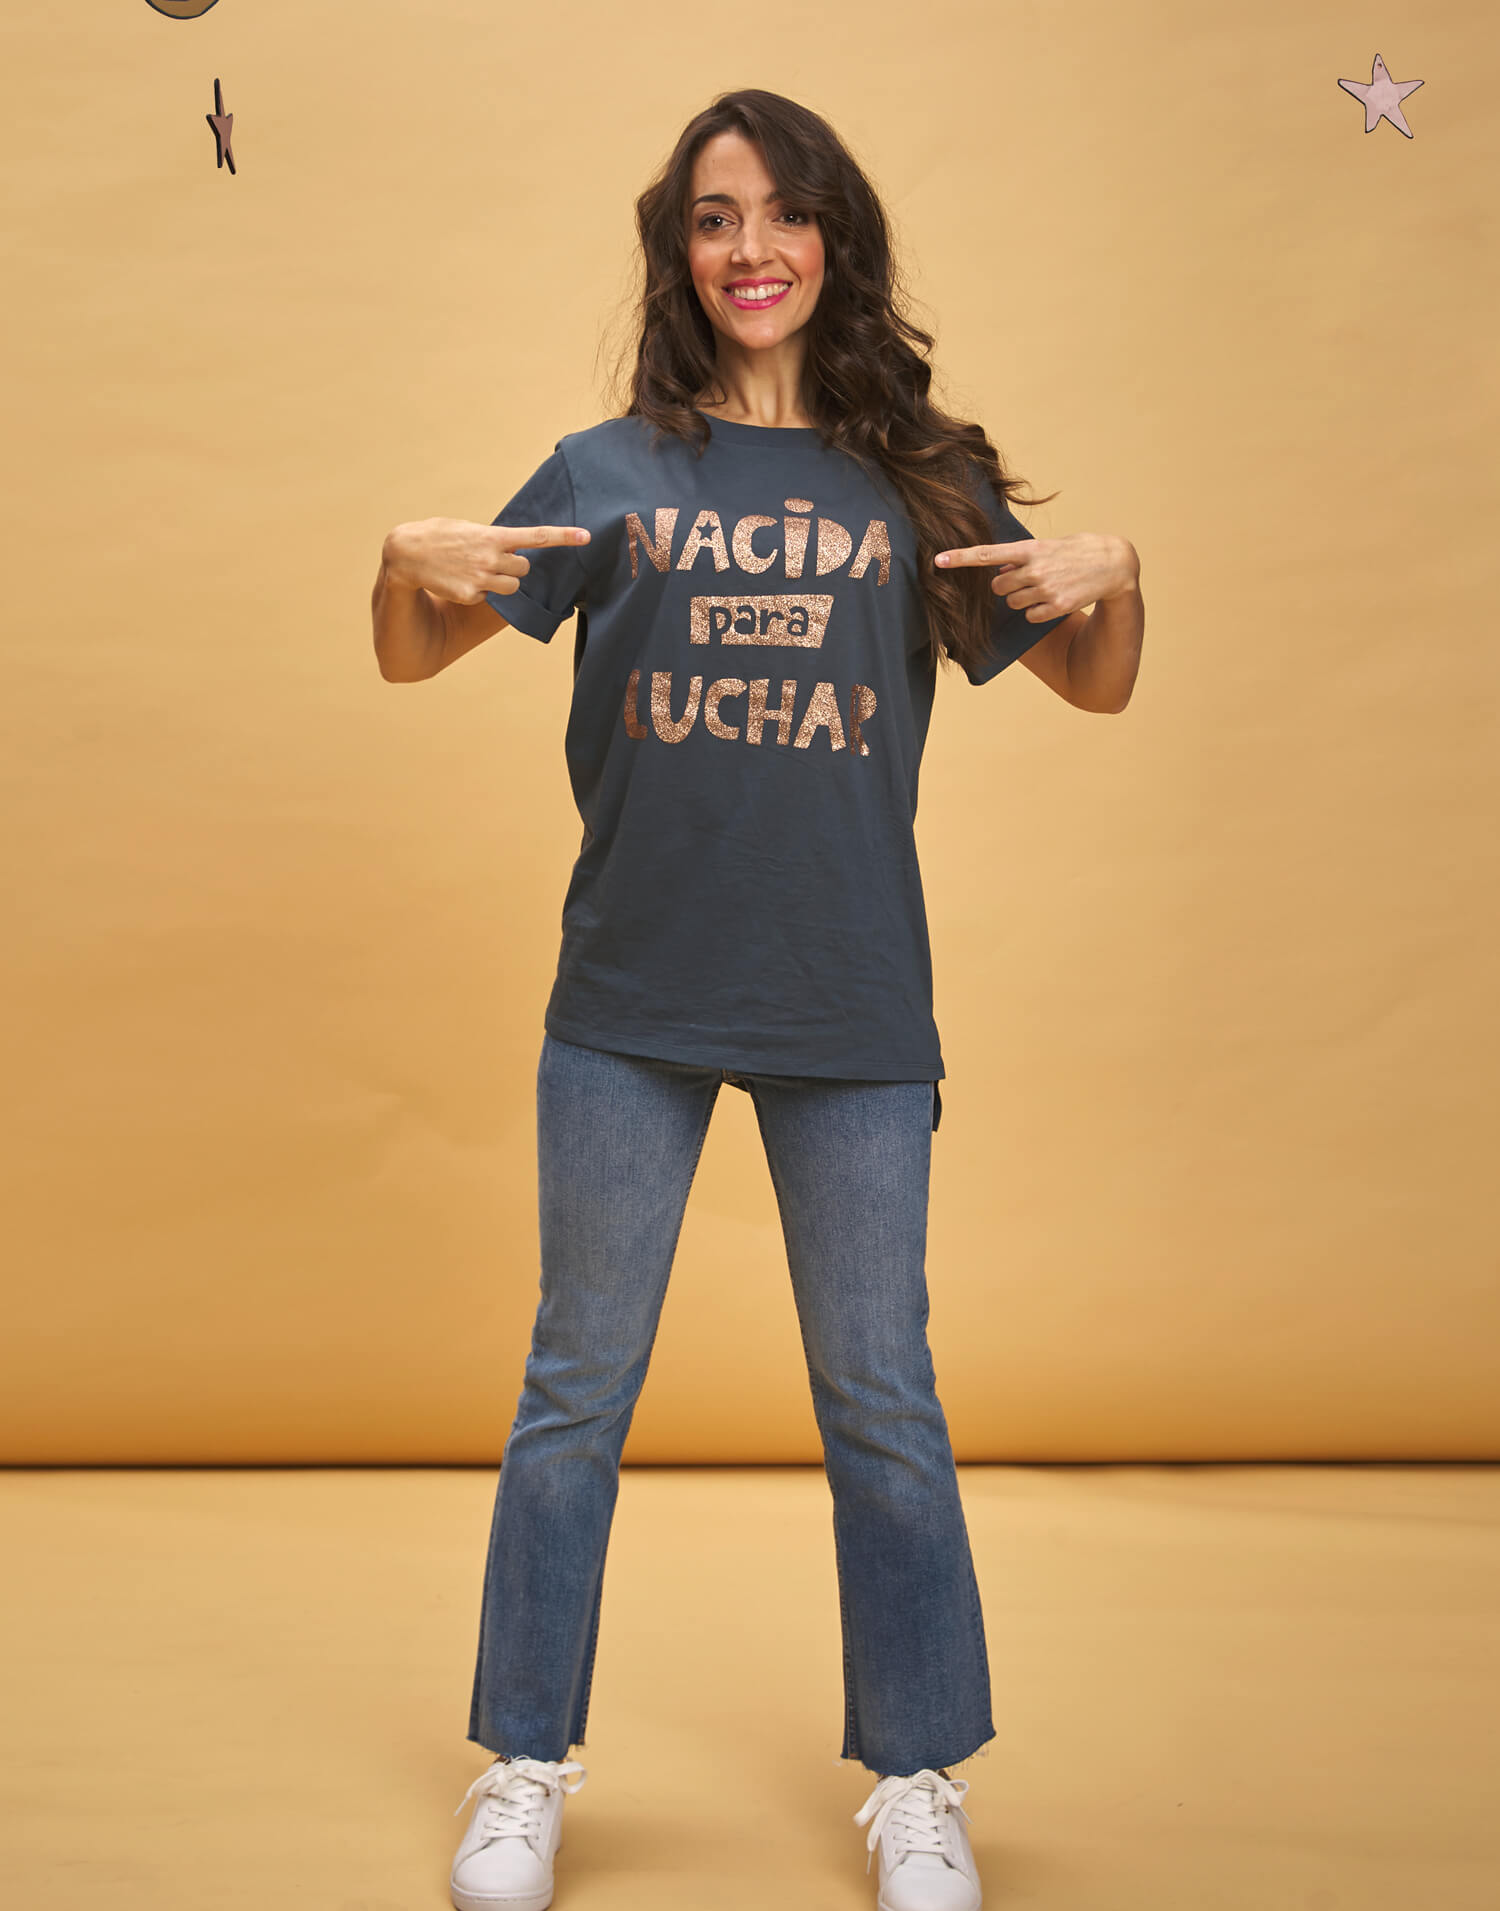 Camiseta de mujer 'Nacida para luchar'